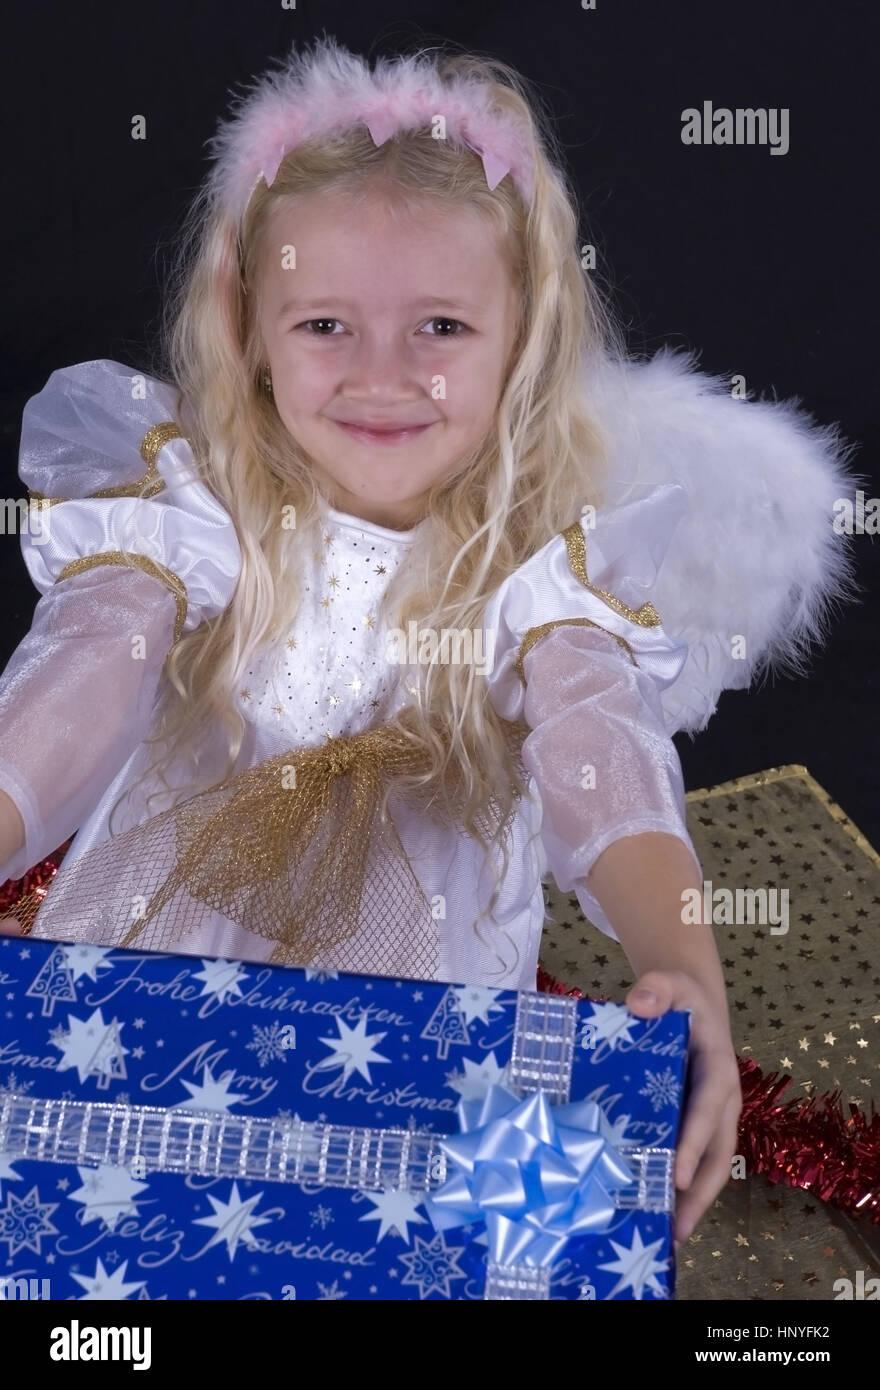 Angels Fancy Dress Stock Photos & Angels Fancy Dress Stock Images ...